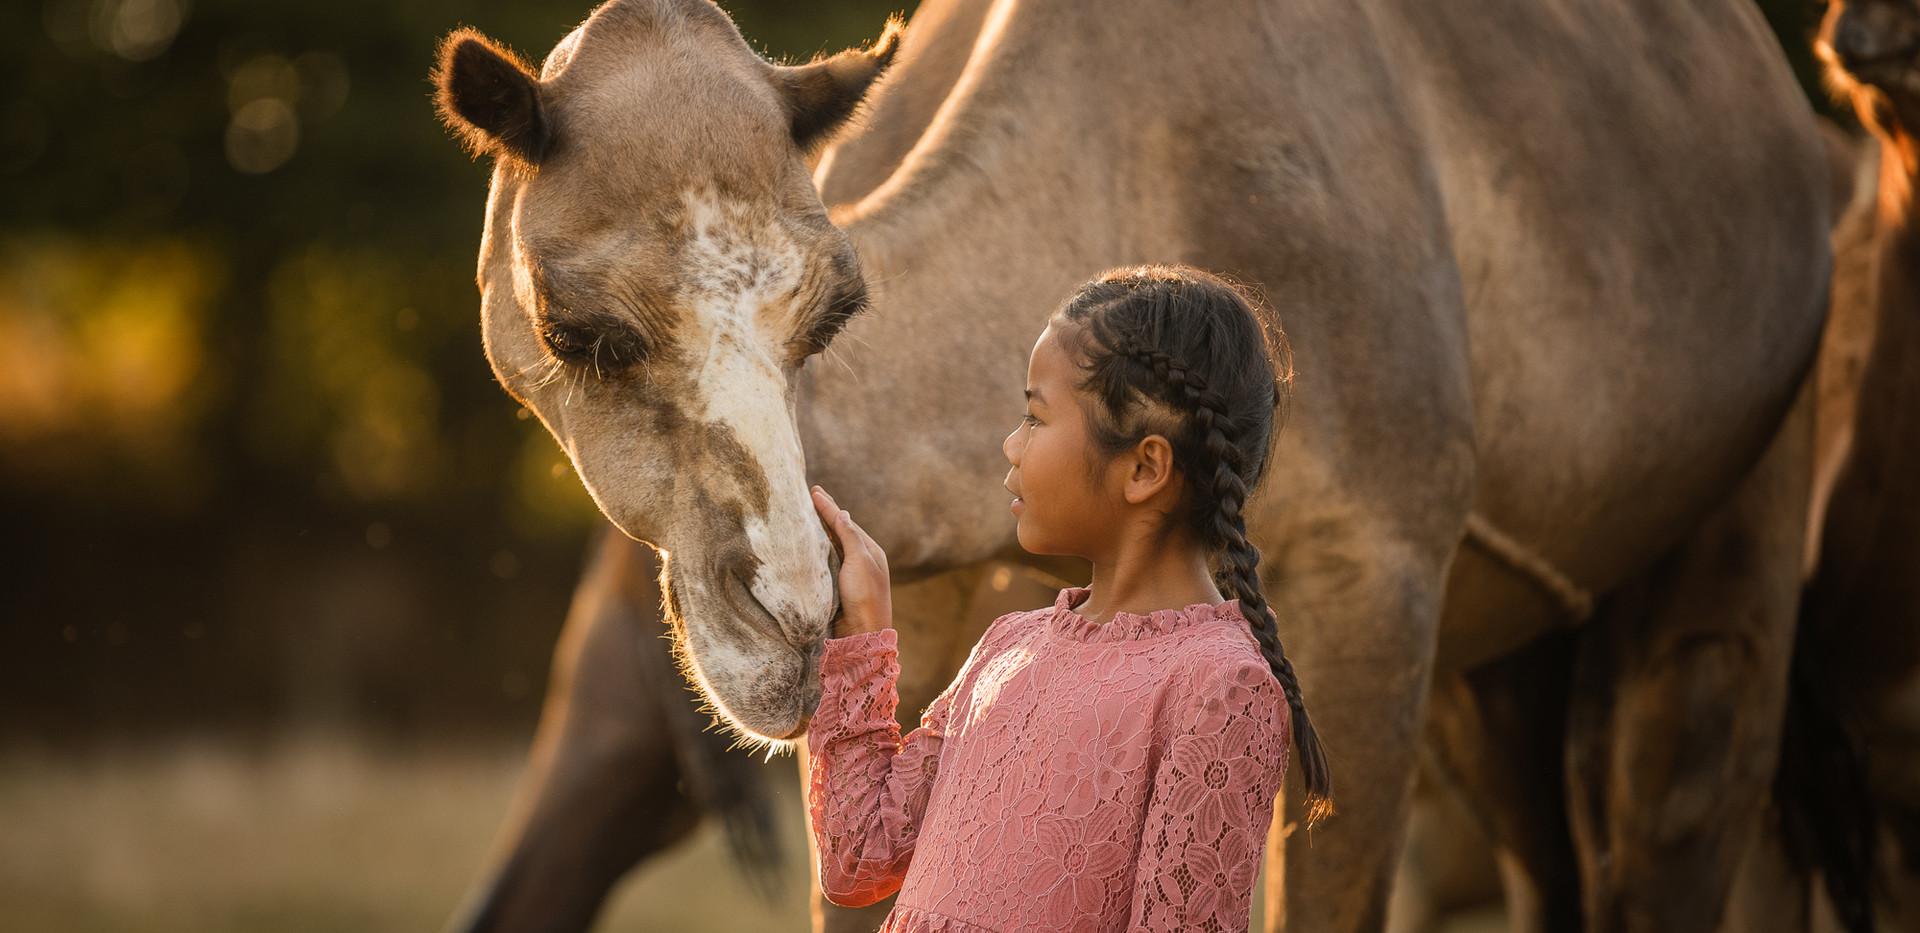 Kalender-Kamele-Susanna-9184_print-Webse